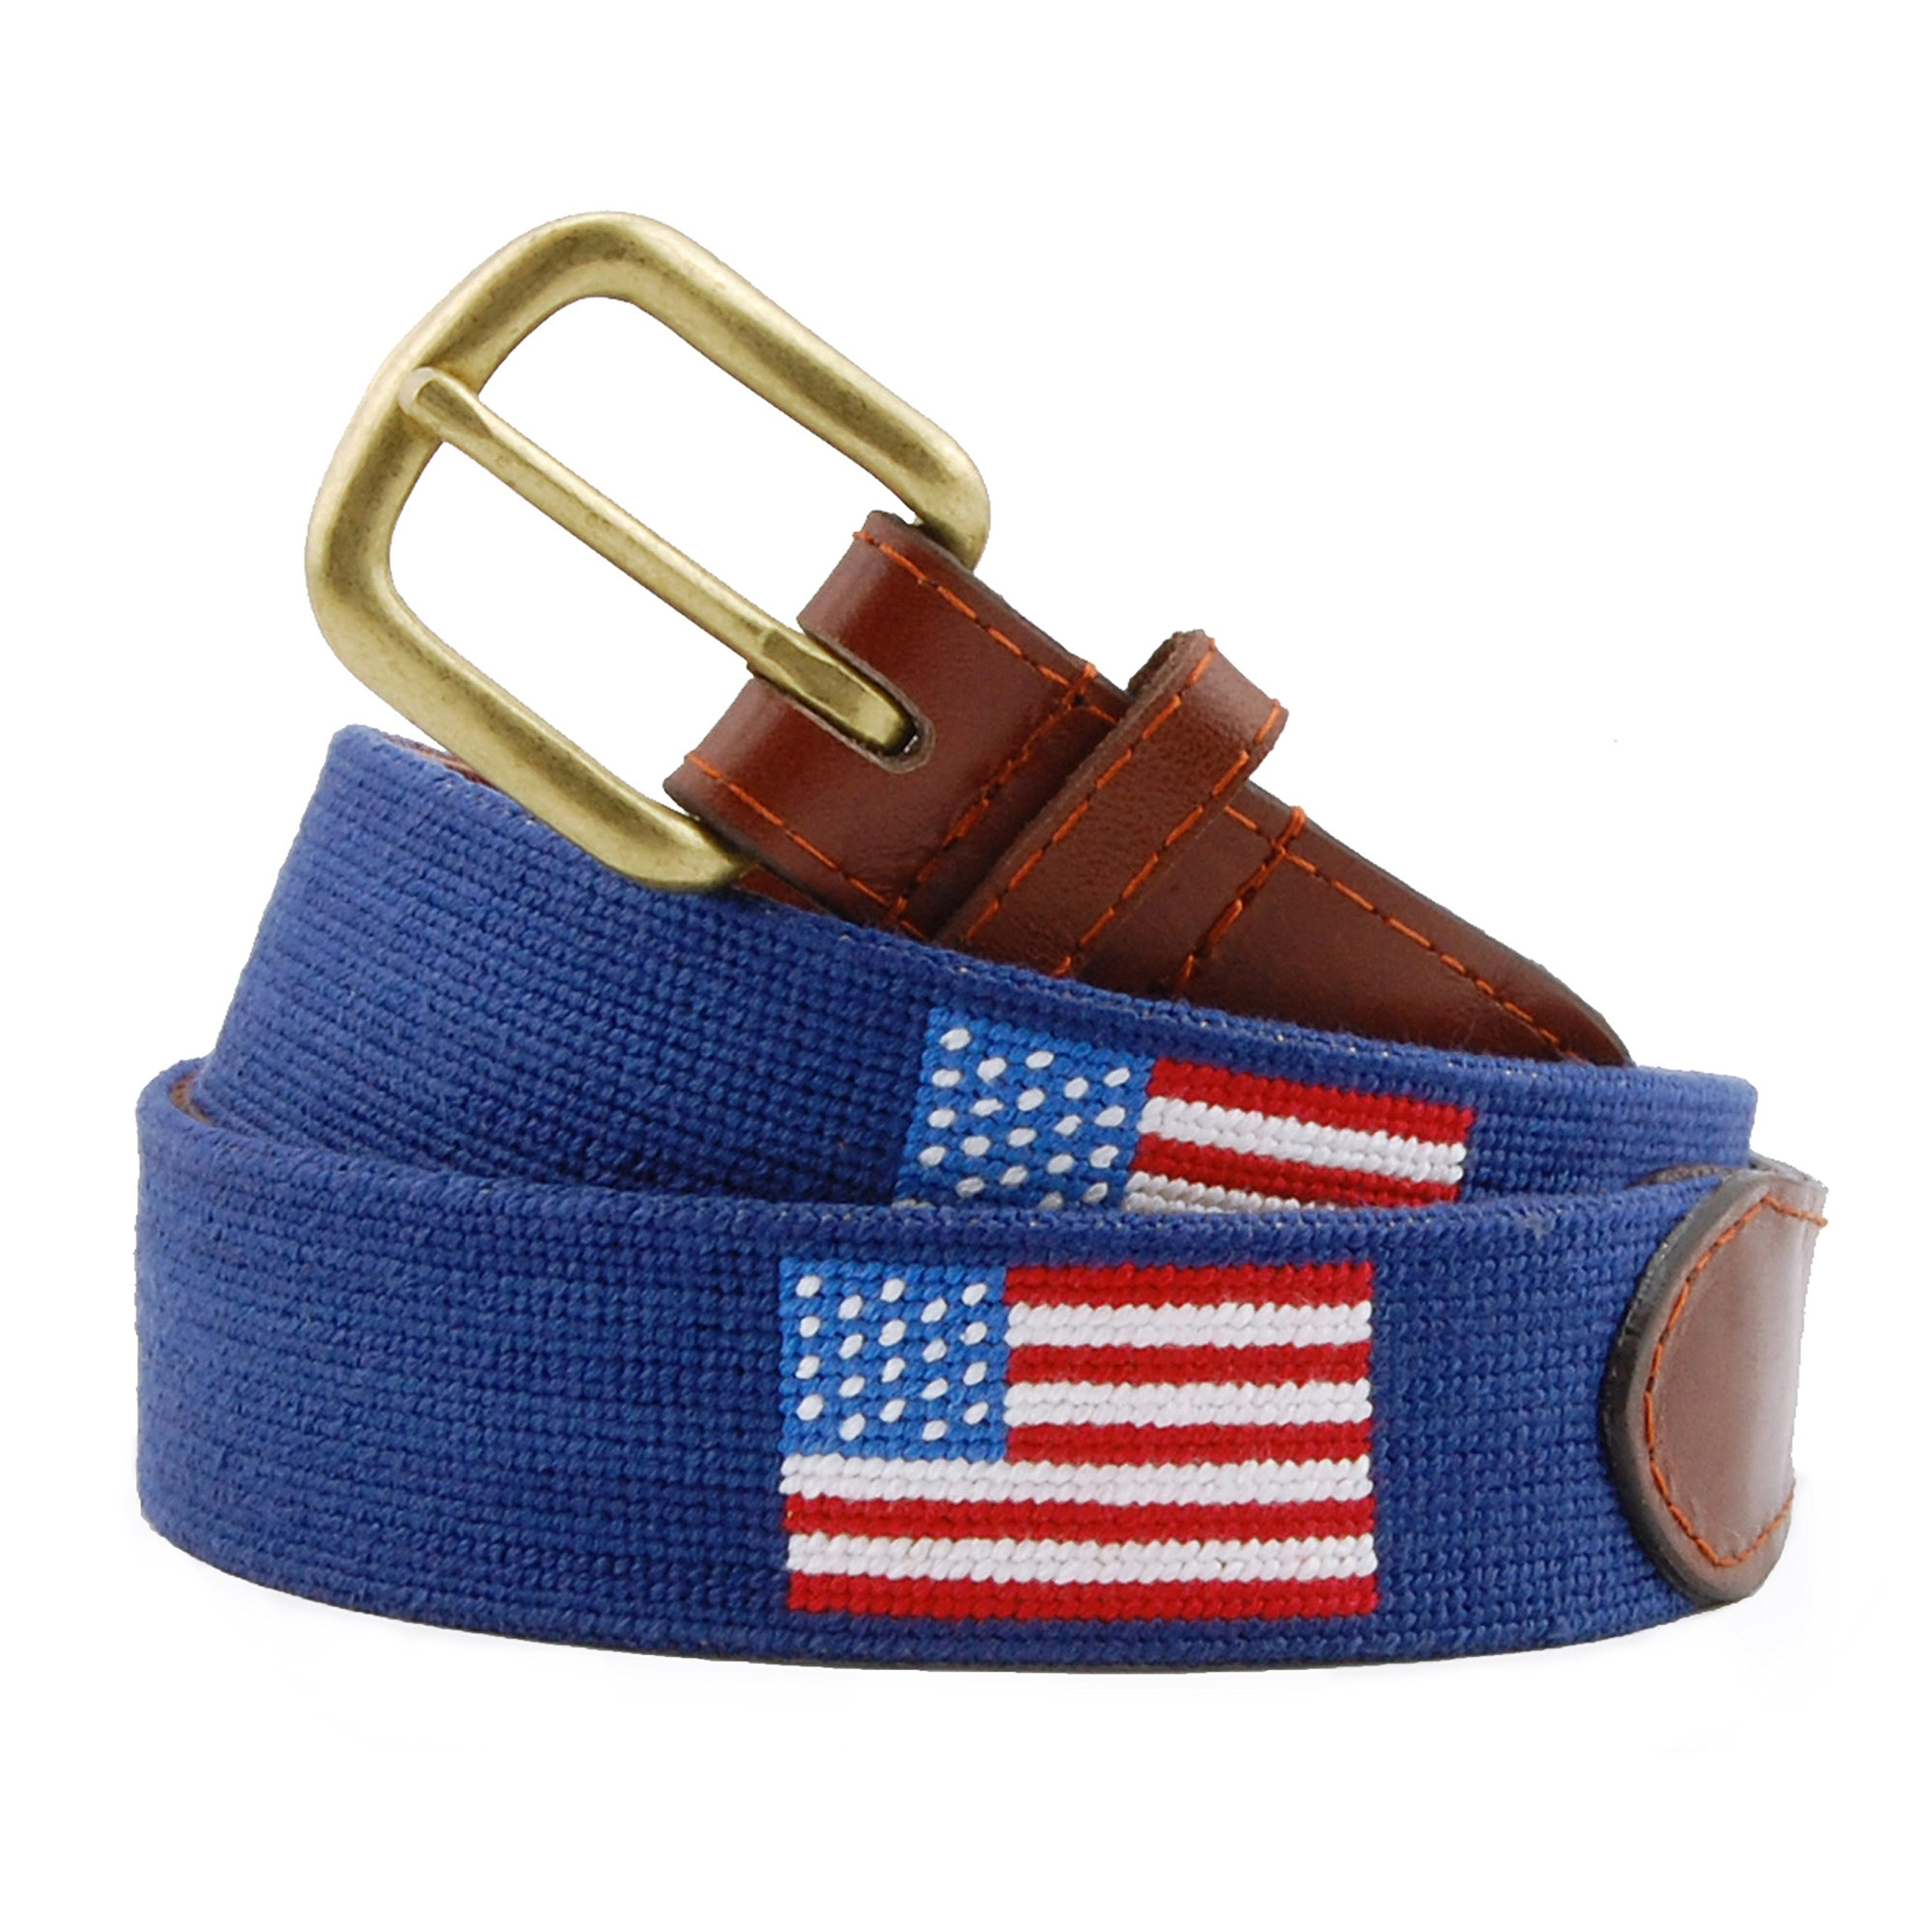 Smathers & Branson Men's American Flag Needlepoint Belt (Navy) 38 Classic Navy by Smathers & Branson